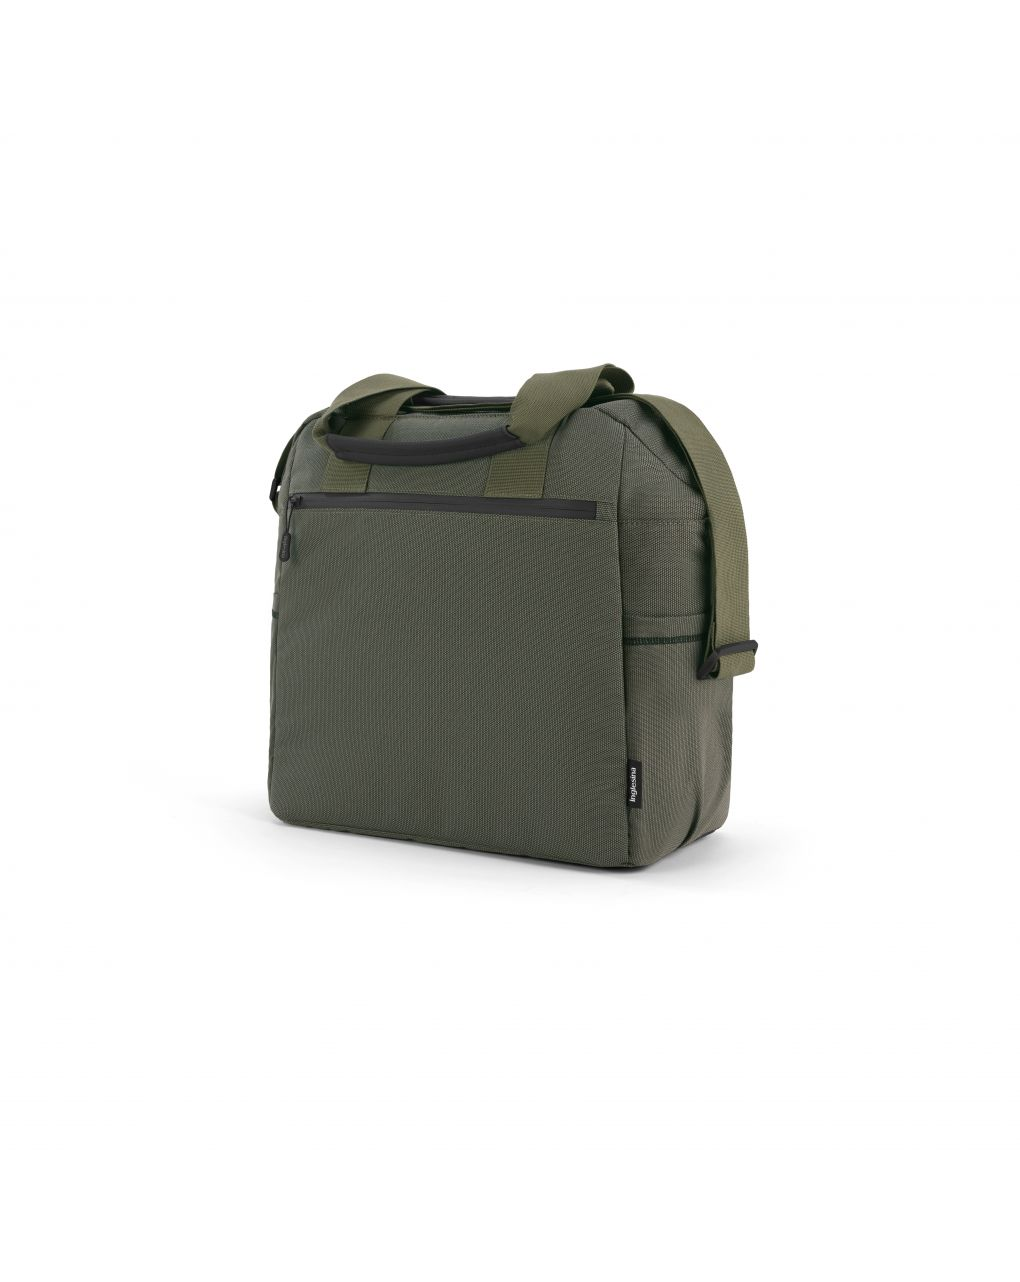 Inglesina aptica xt day bag, sequoia green - Inglesina